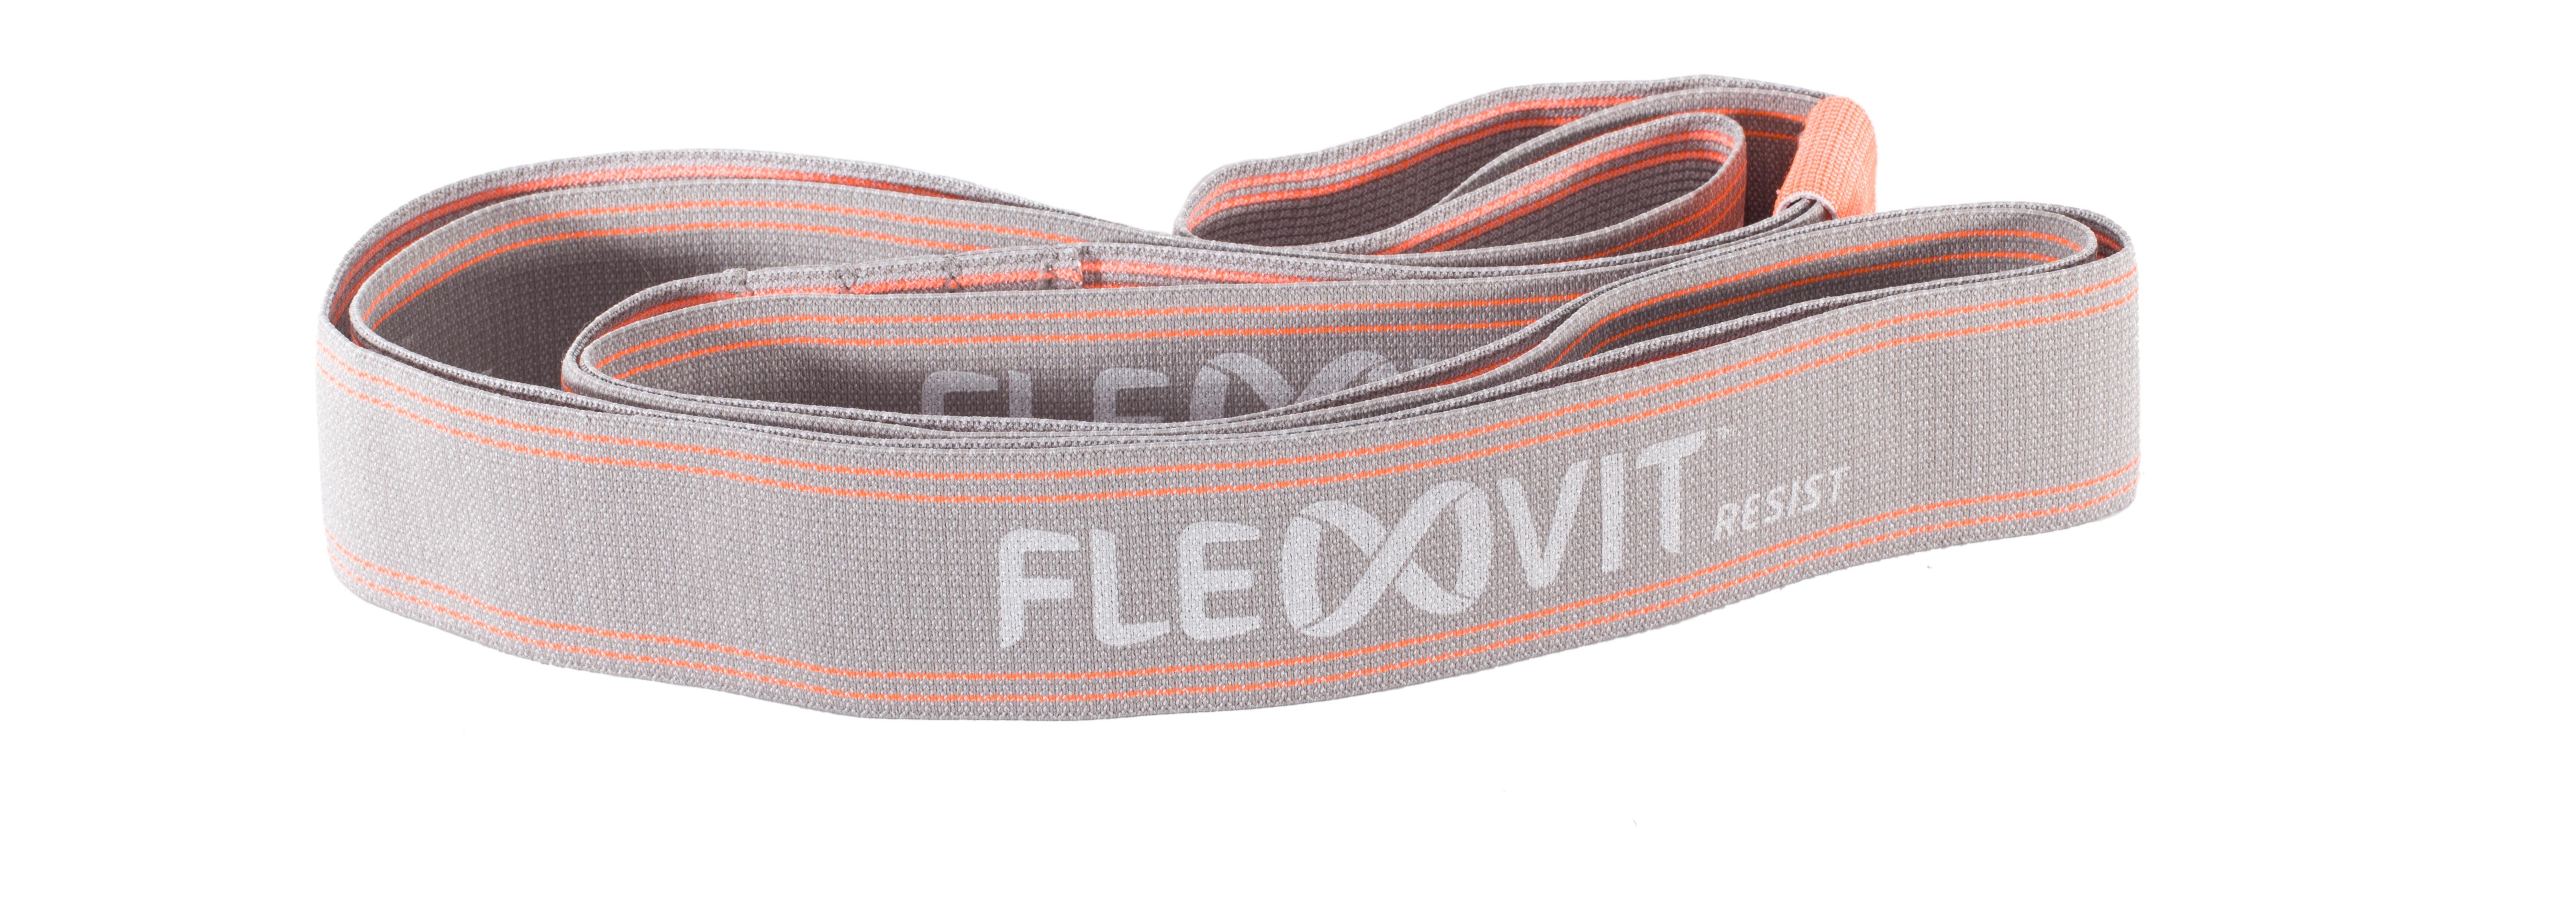 FLEXVIT Resist Band - leicht hellgrau